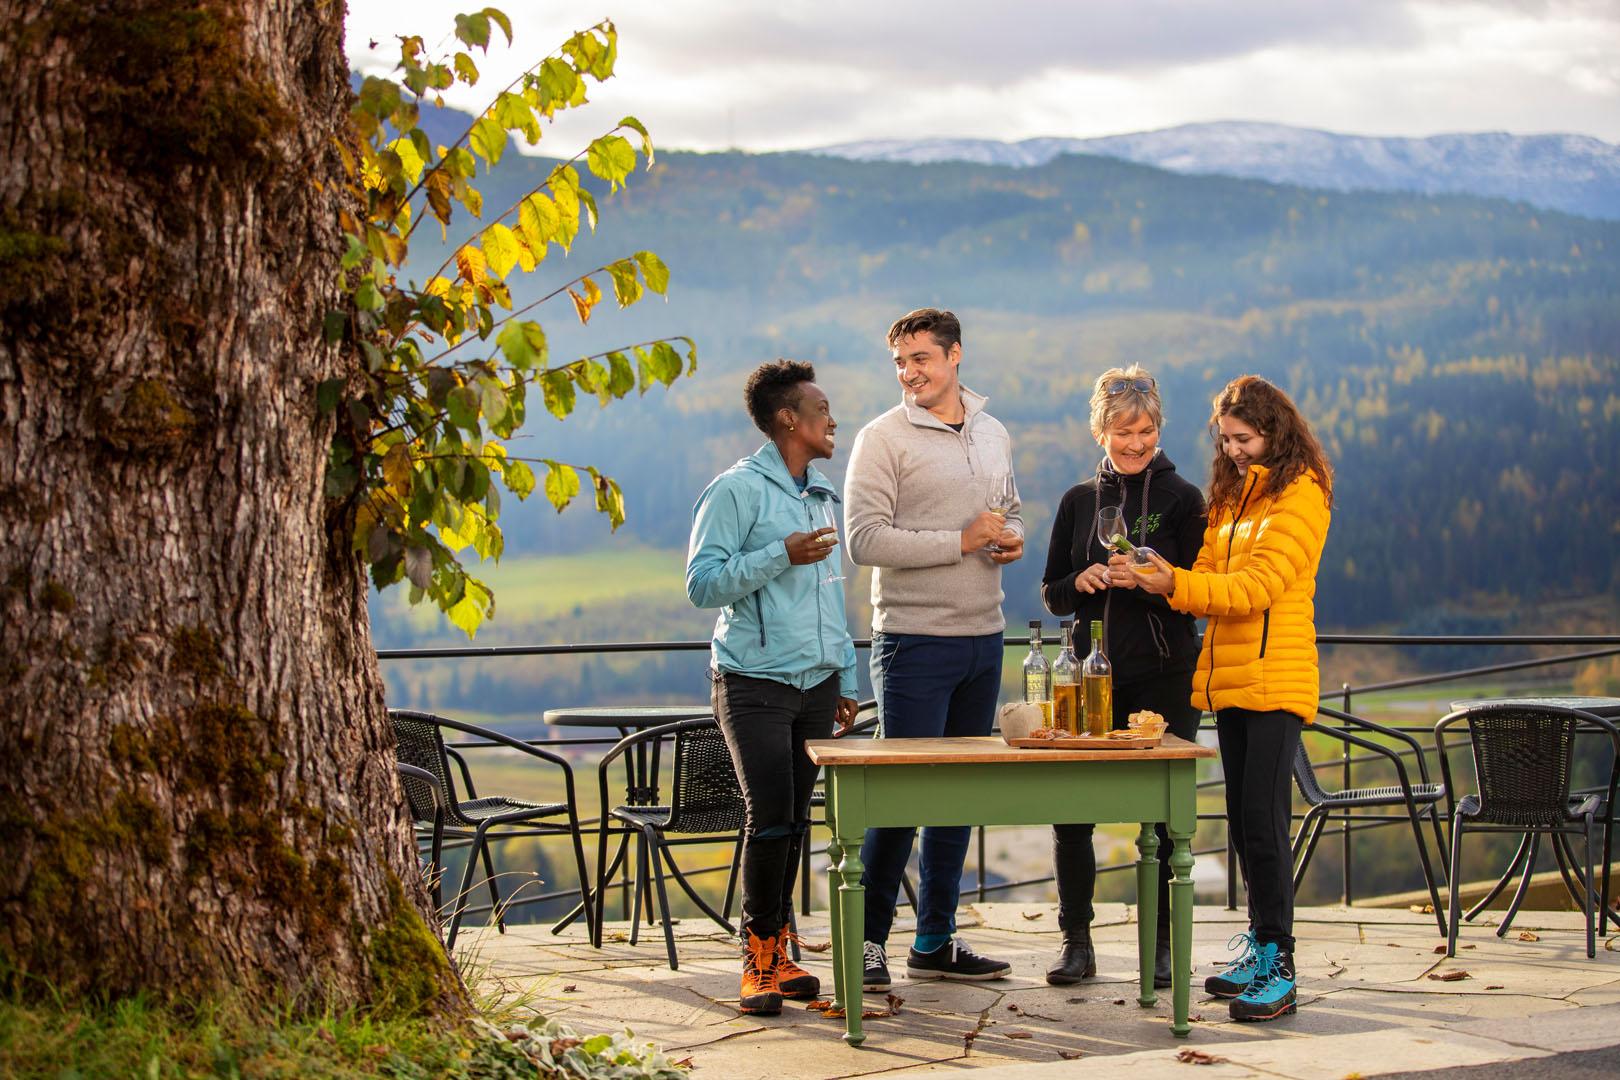 7 Kultur- og matopplevingar i Ulvik som du aldri vil gløyme